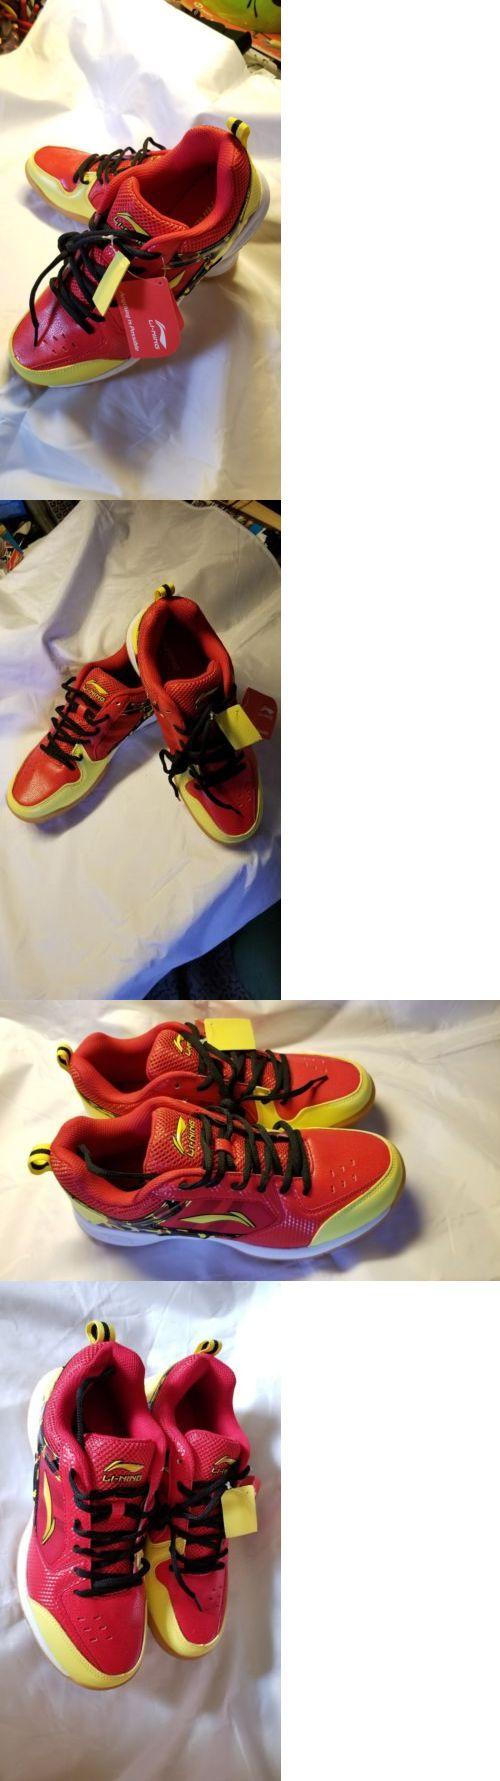 Badminton 106460: Li-Ning Aytk115-3 Icon Ii Badminton Shoes Red,Yellow, Black. Men Size, 8.5 -> BUY IT NOW ONLY: $68 on eBay!